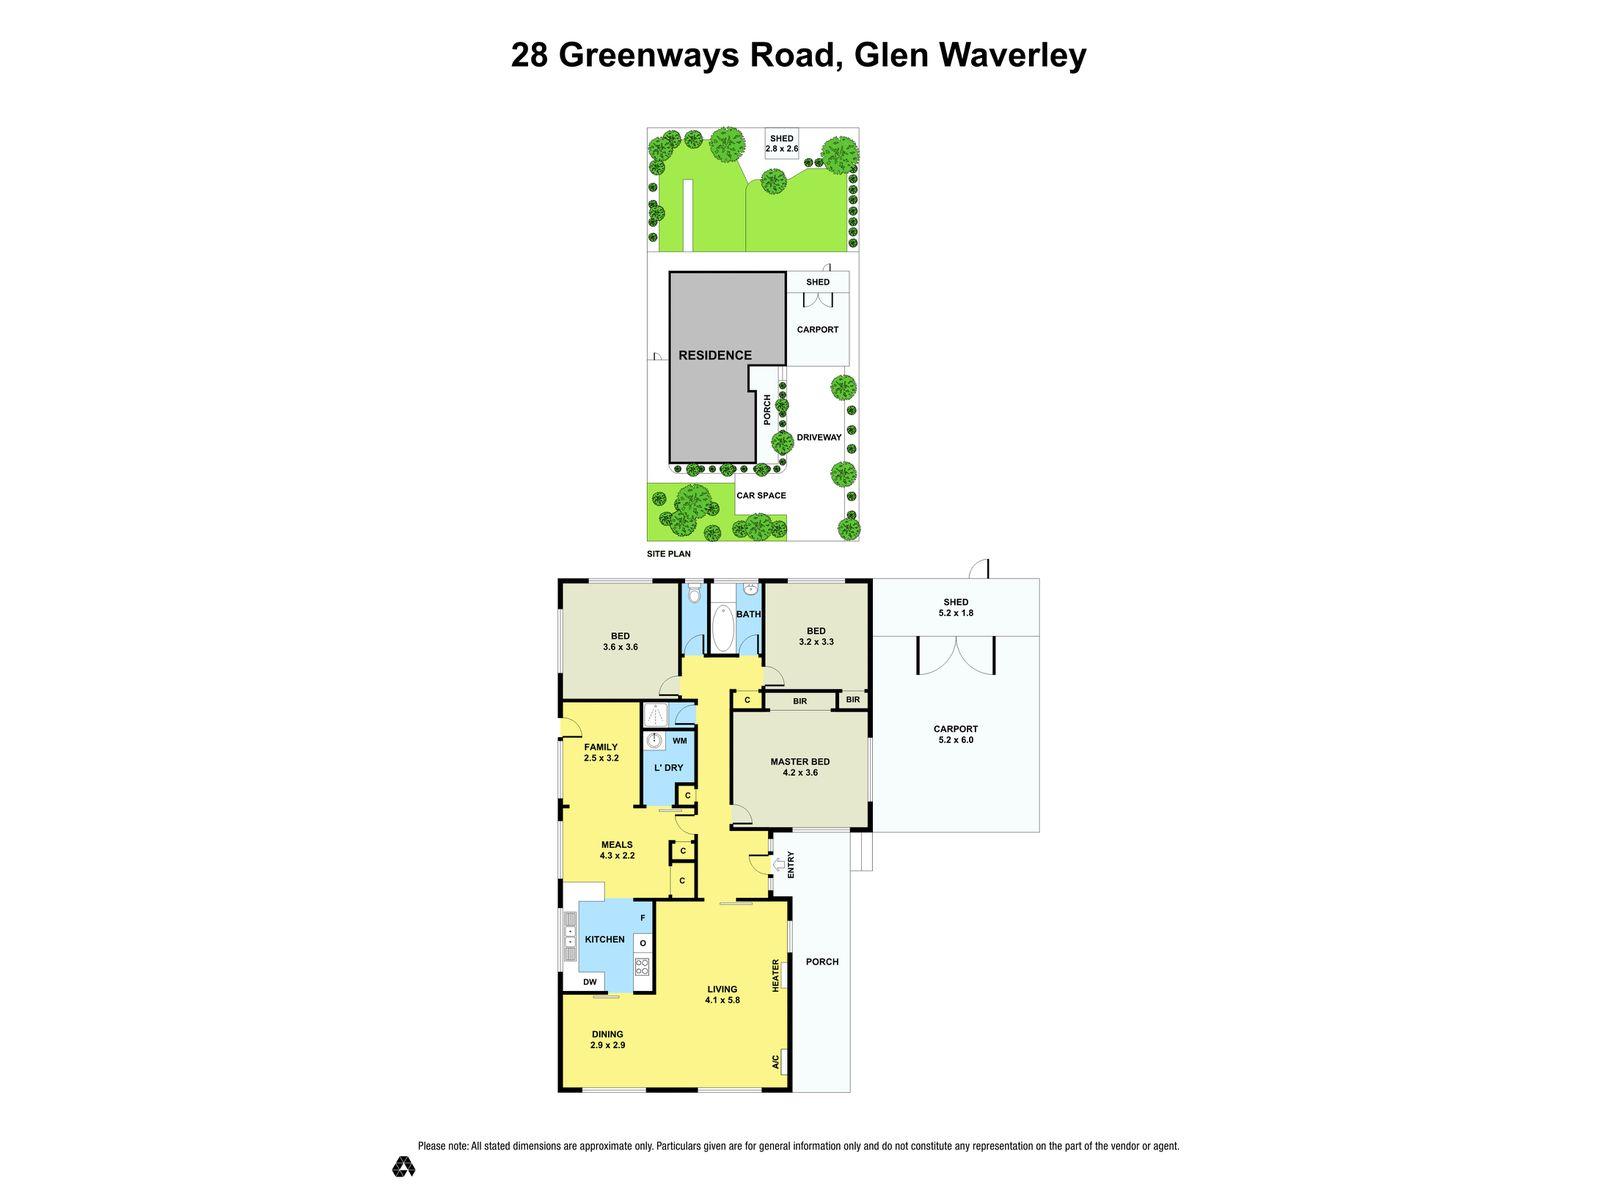 28 Greenways Road, Glen Waverley